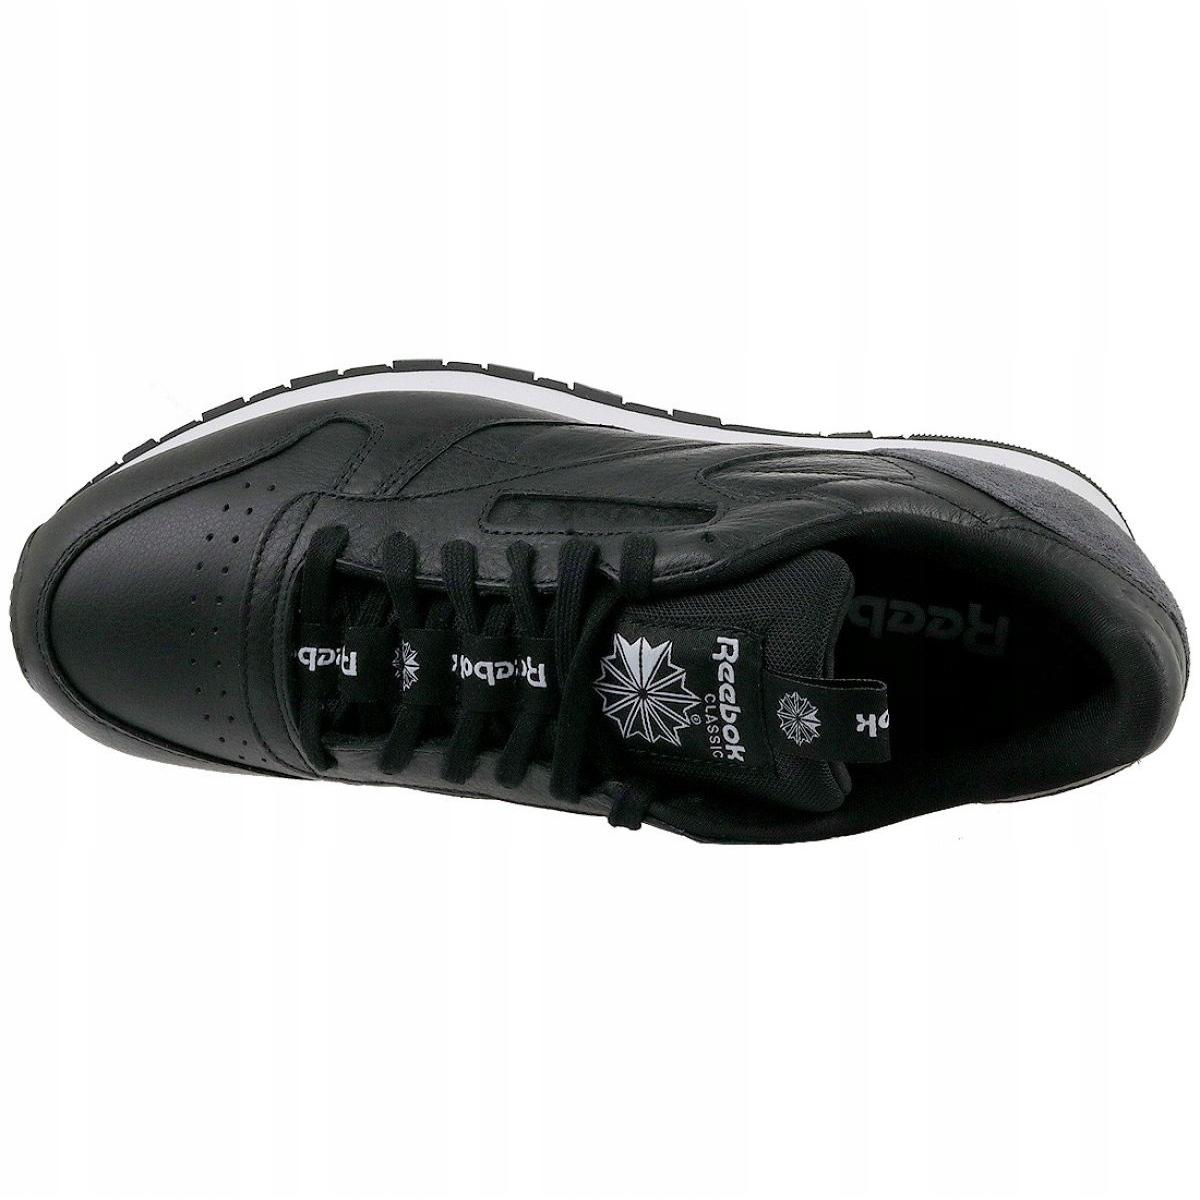 Reebok Classic Lthr It M BS6210 shoes